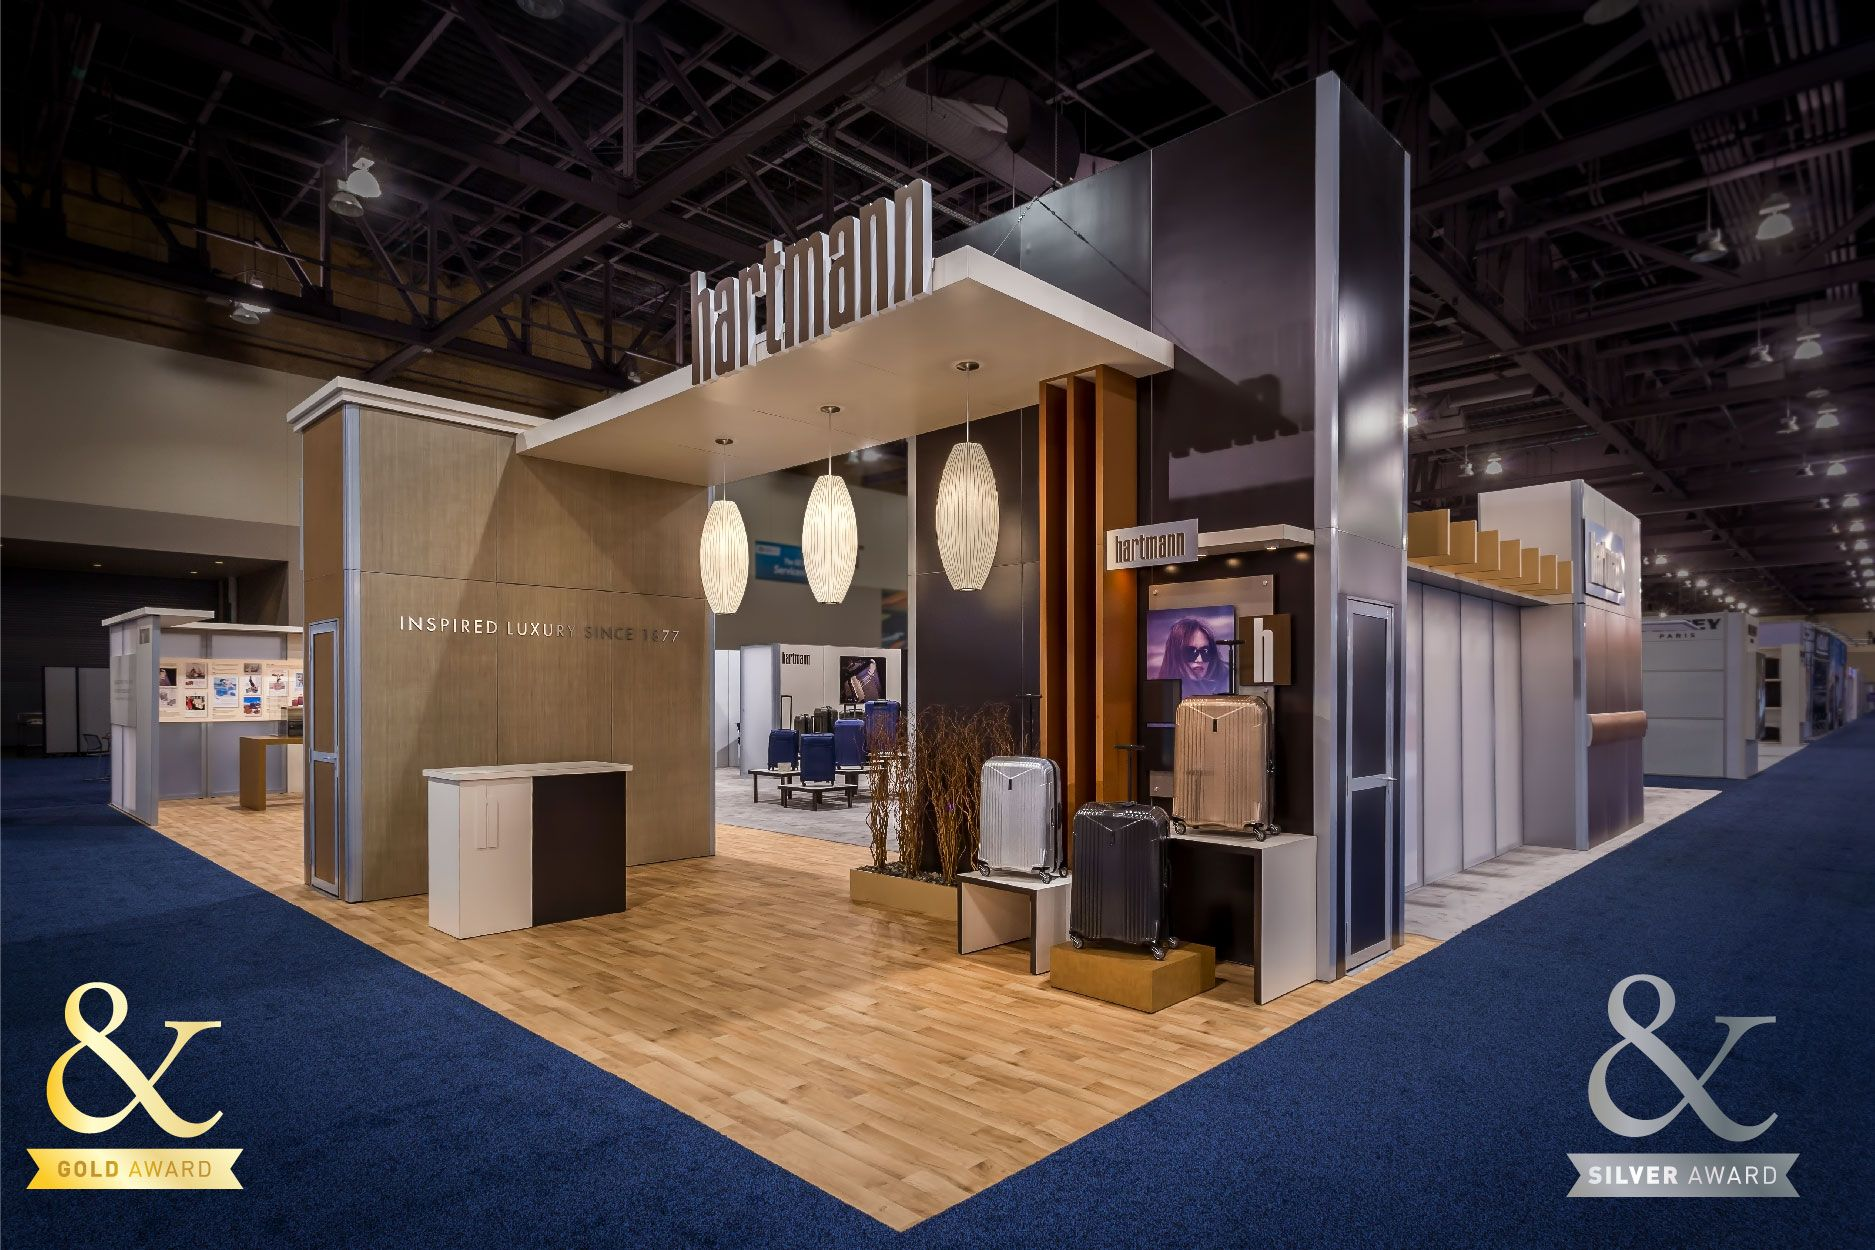 Exhibition Booth Design Award : Award winning hartmann booth branded environments